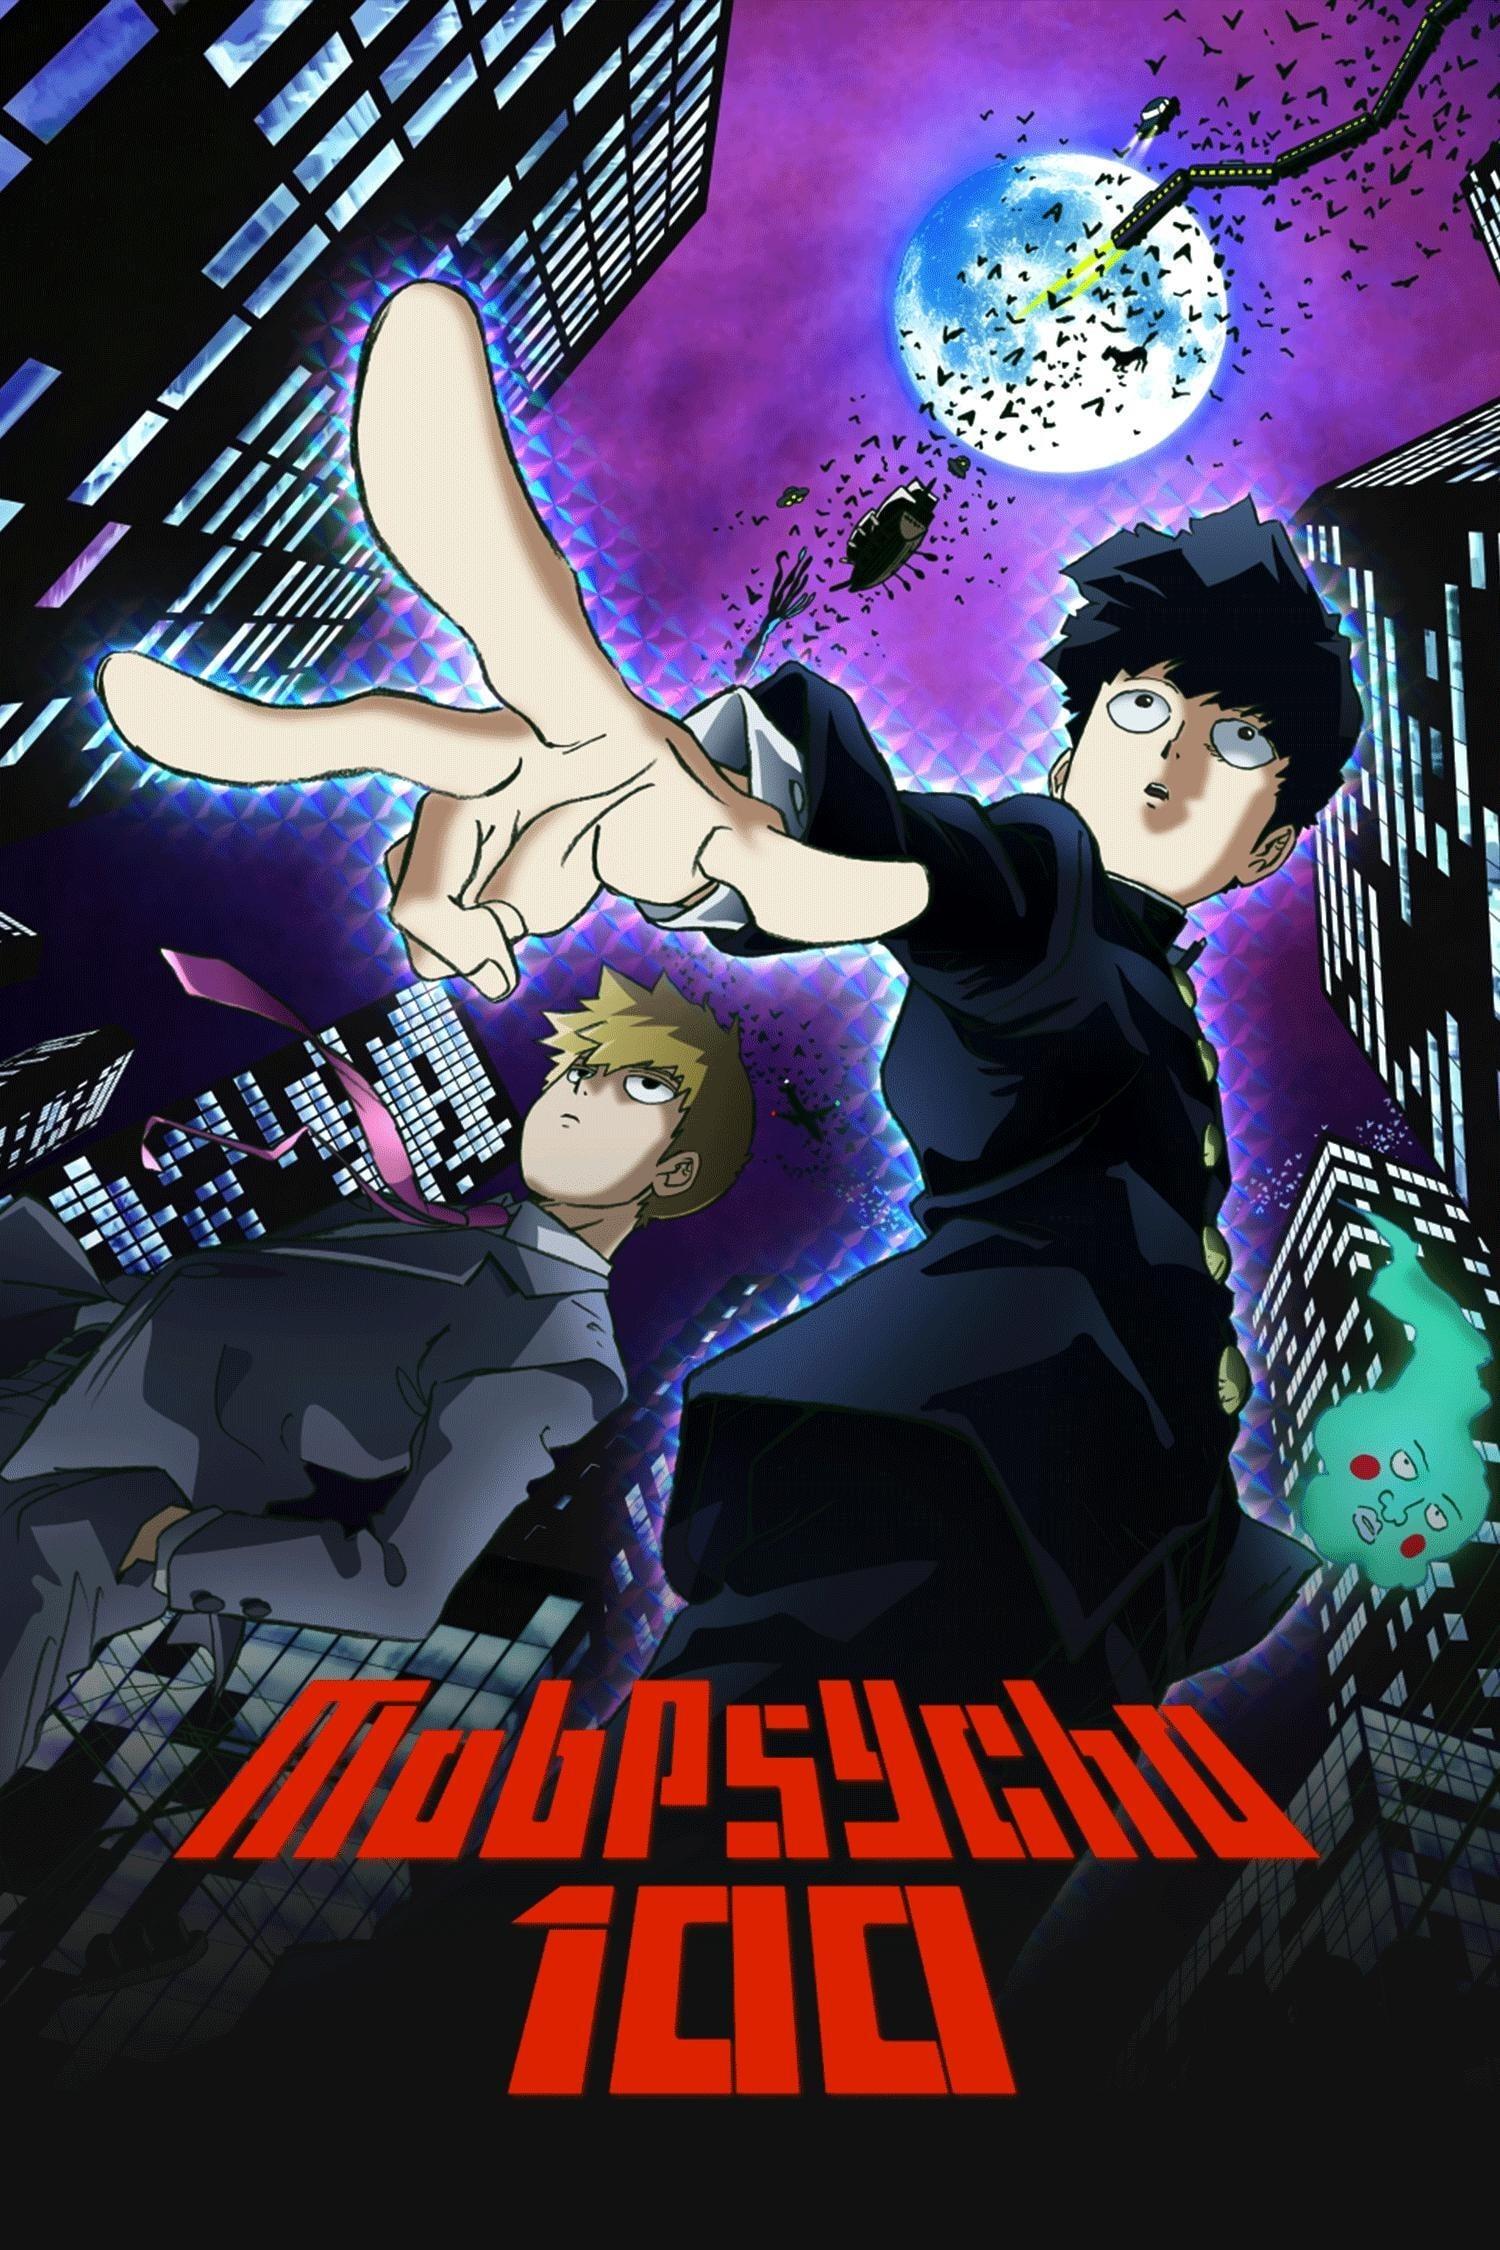 season 1 of mob psycho 100 2016 plex